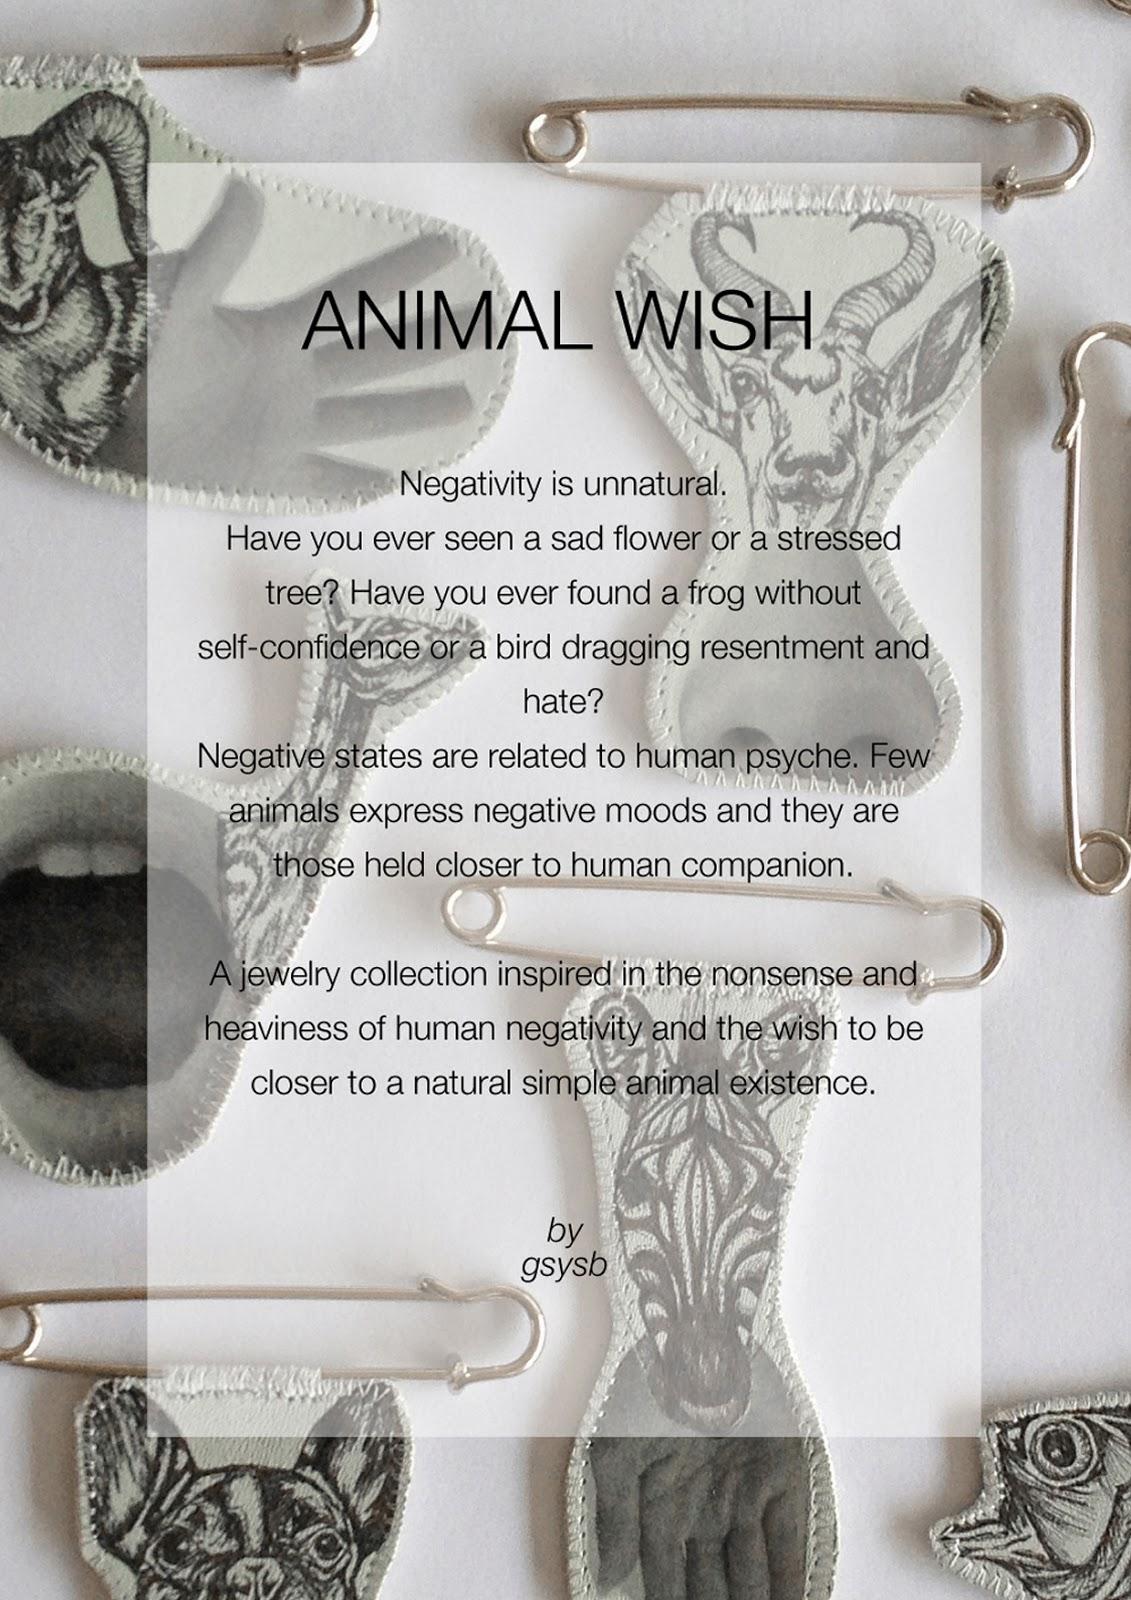 animal_wish(es)_gbriela_sanchez_11.jpg